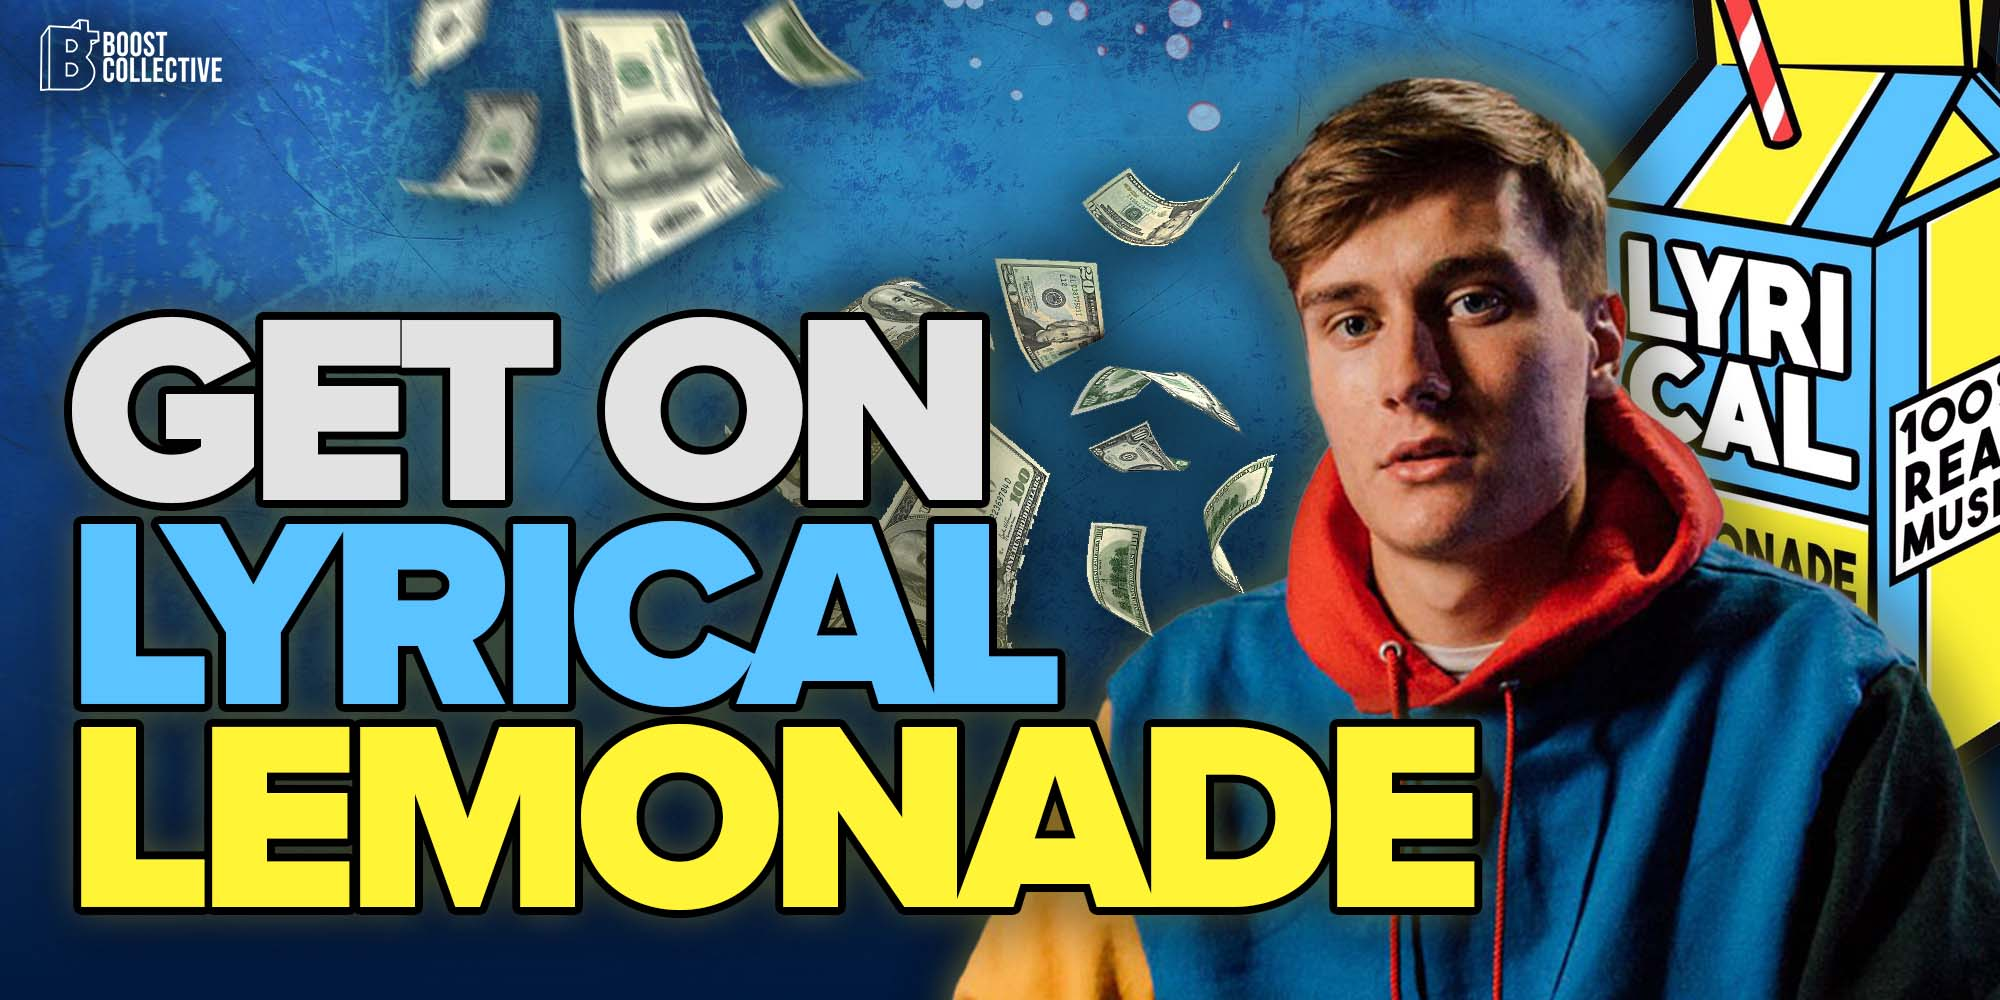 How To Get On Lyrical Lemonade